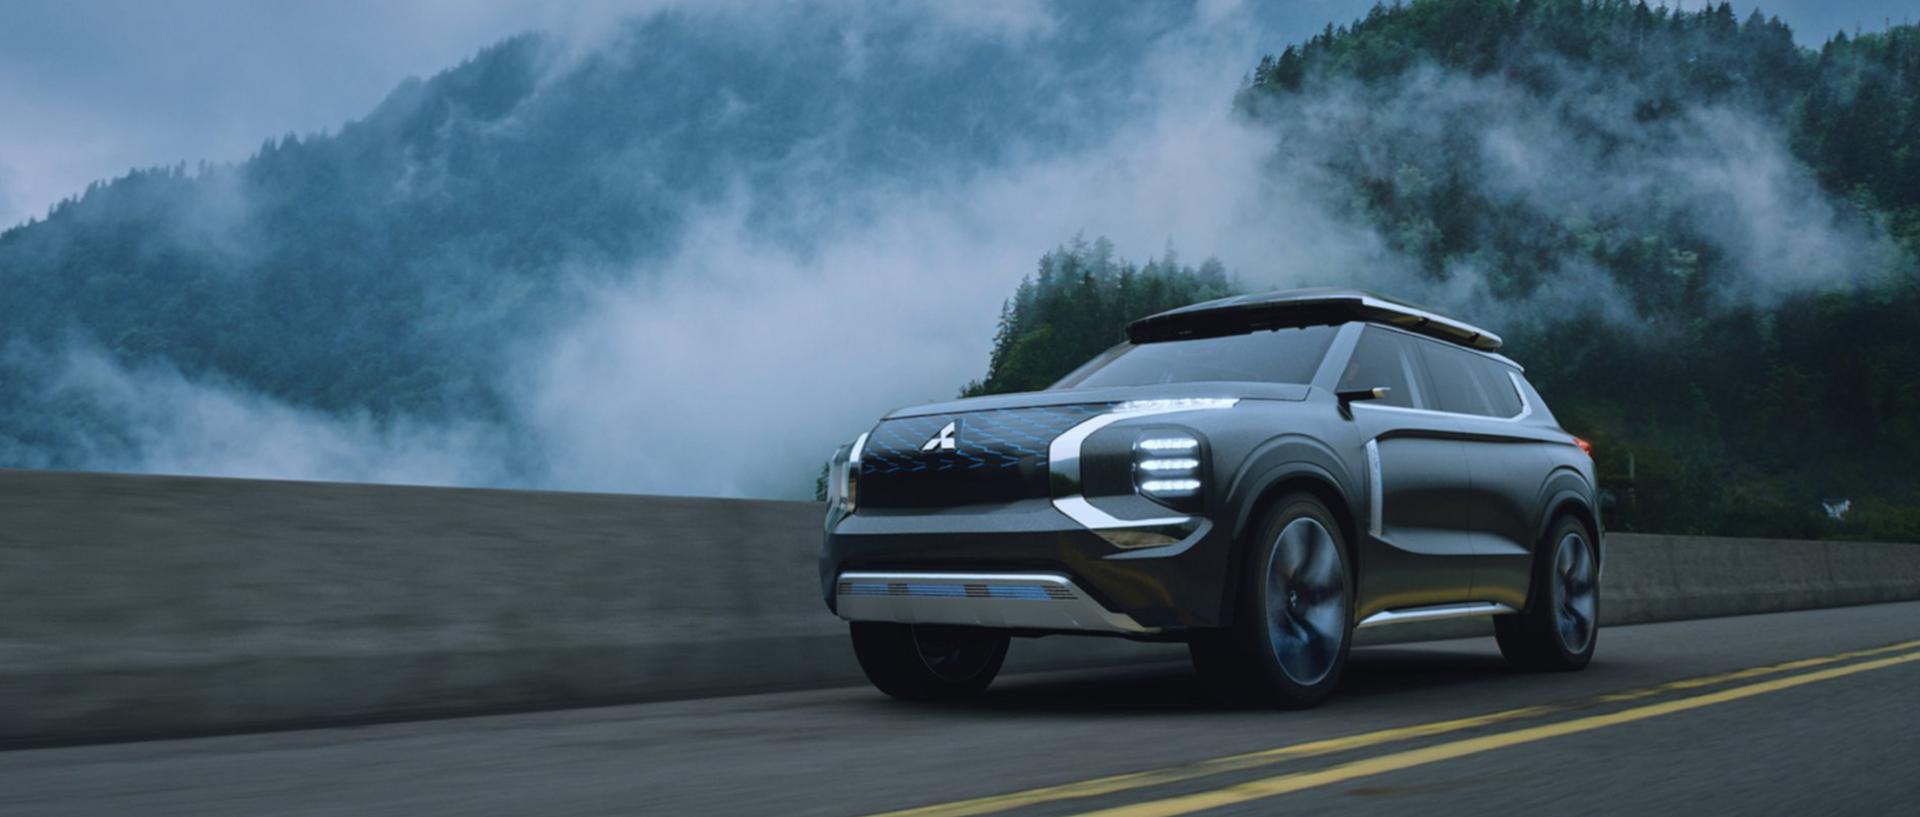 Mitsubishi — eYi Concept